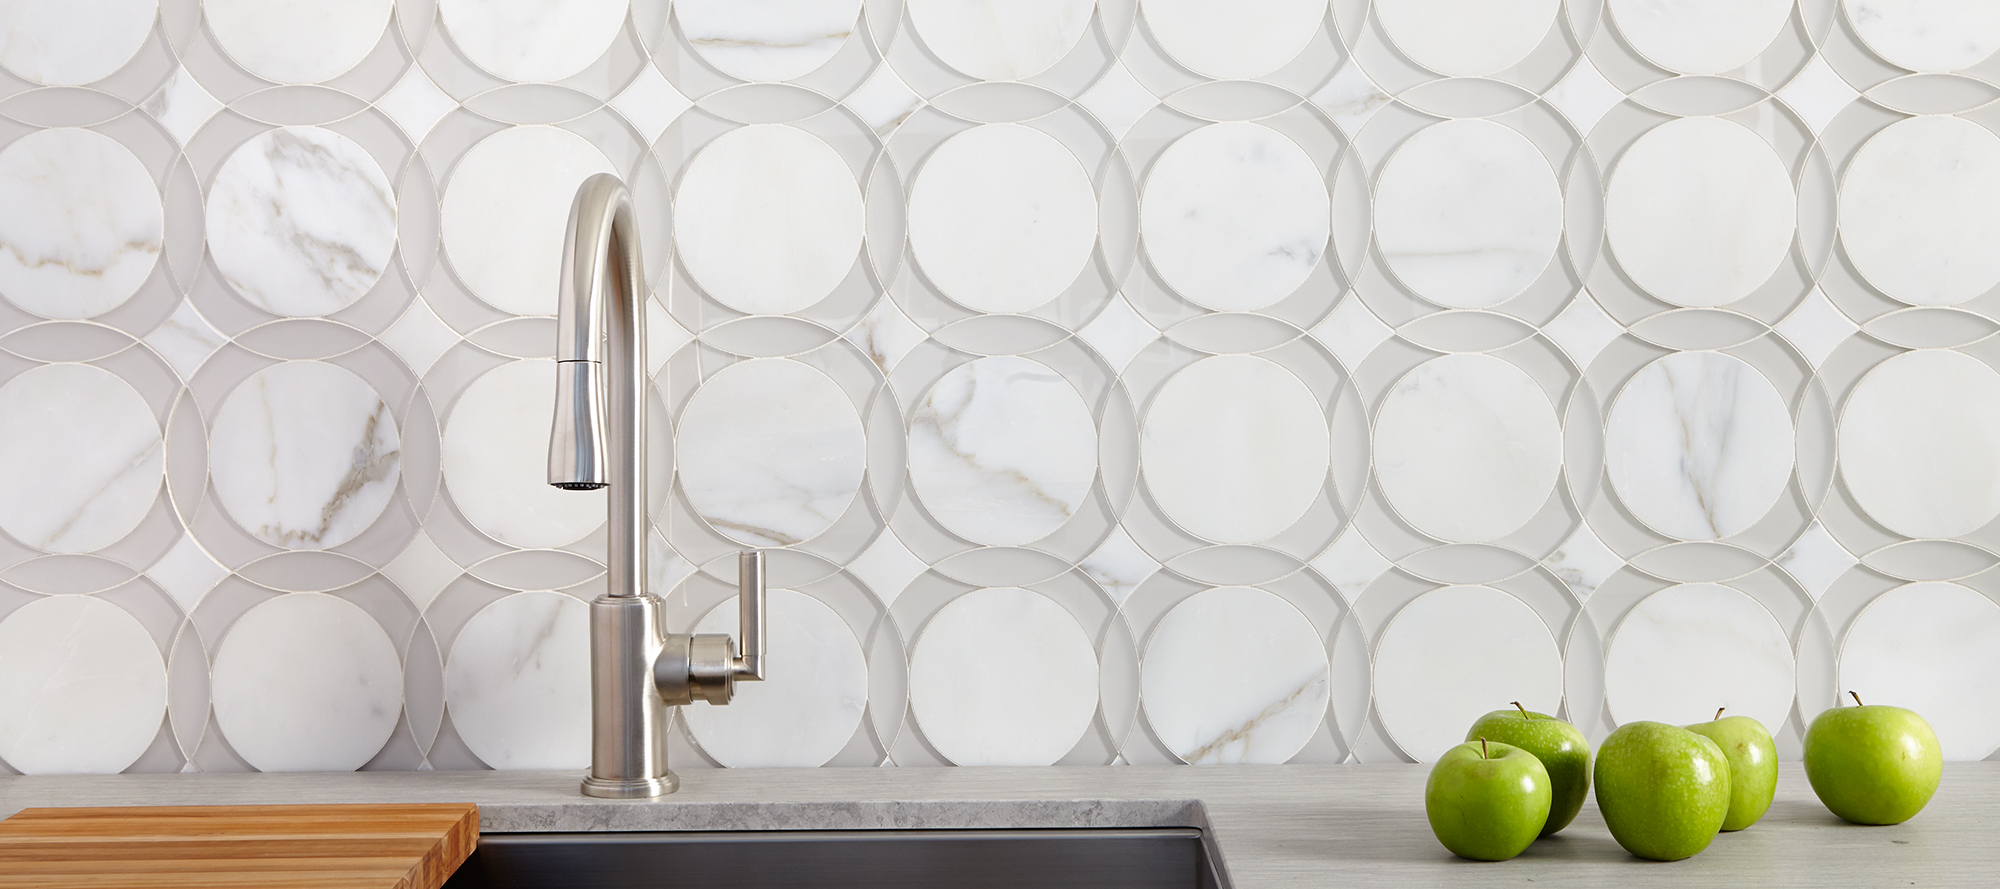 Vir Stil Minimal by Laura Kirar Pull-Down Kitchen Faucet | P23071 ...